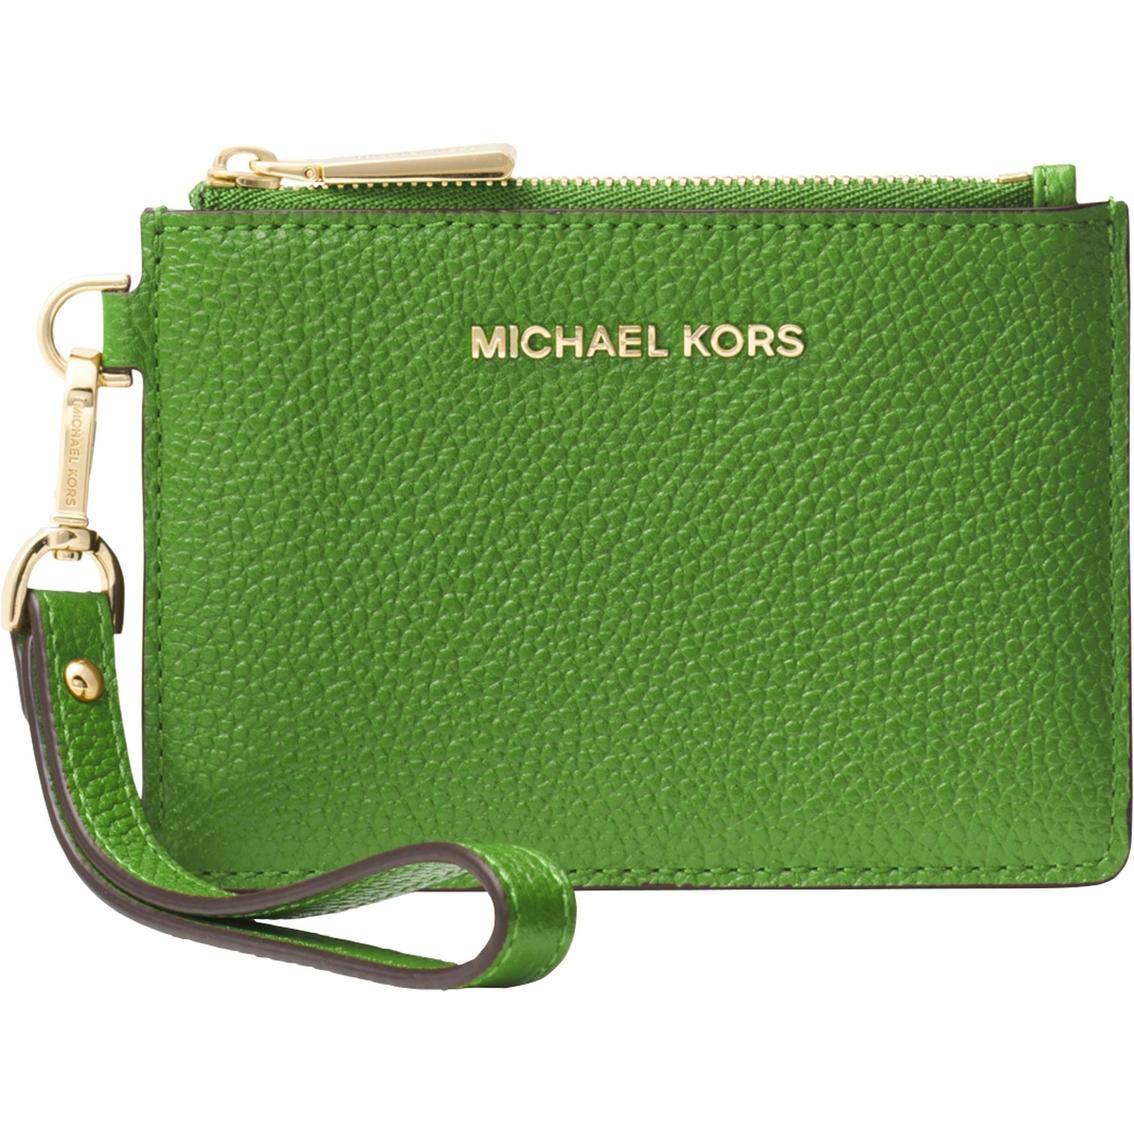 Michael Kors Mercer Small Coin Purse | Accessories | Apparel | Shop ...